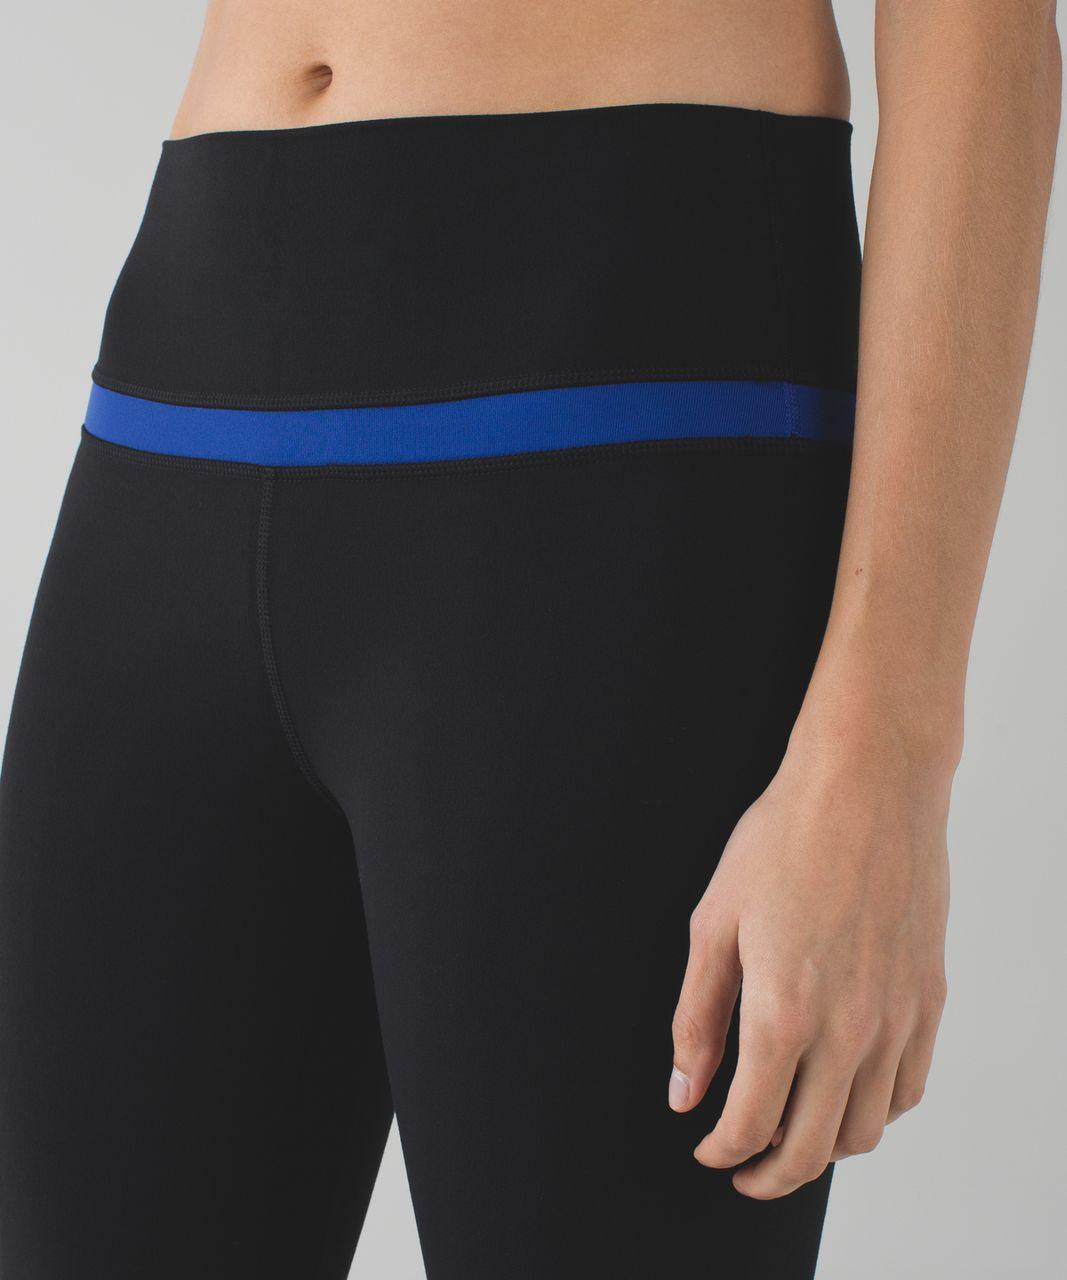 Lululemon Align Pant - Black / Sapphire Blue